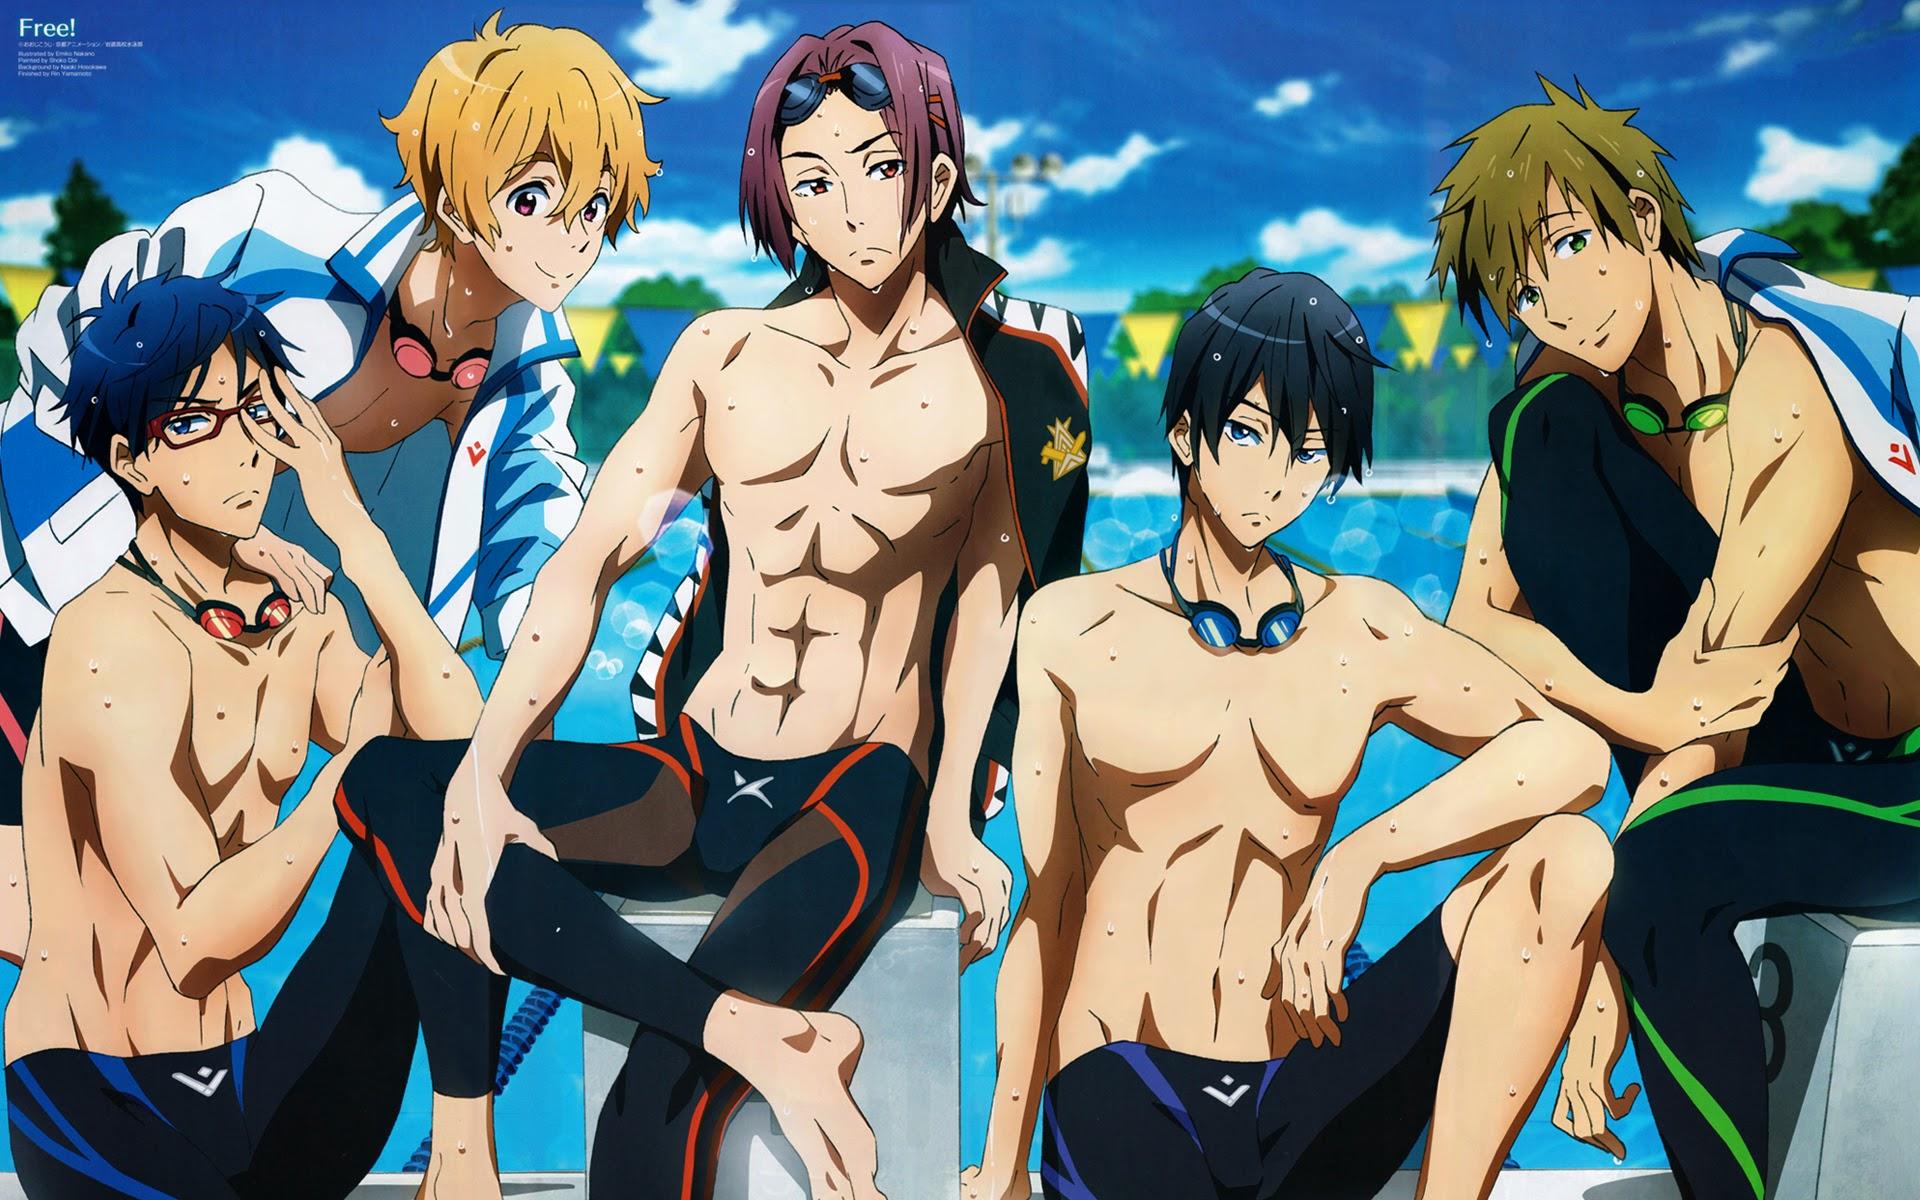 Free Anime Iwatobi Swim Club A95 Hd Wallpaper